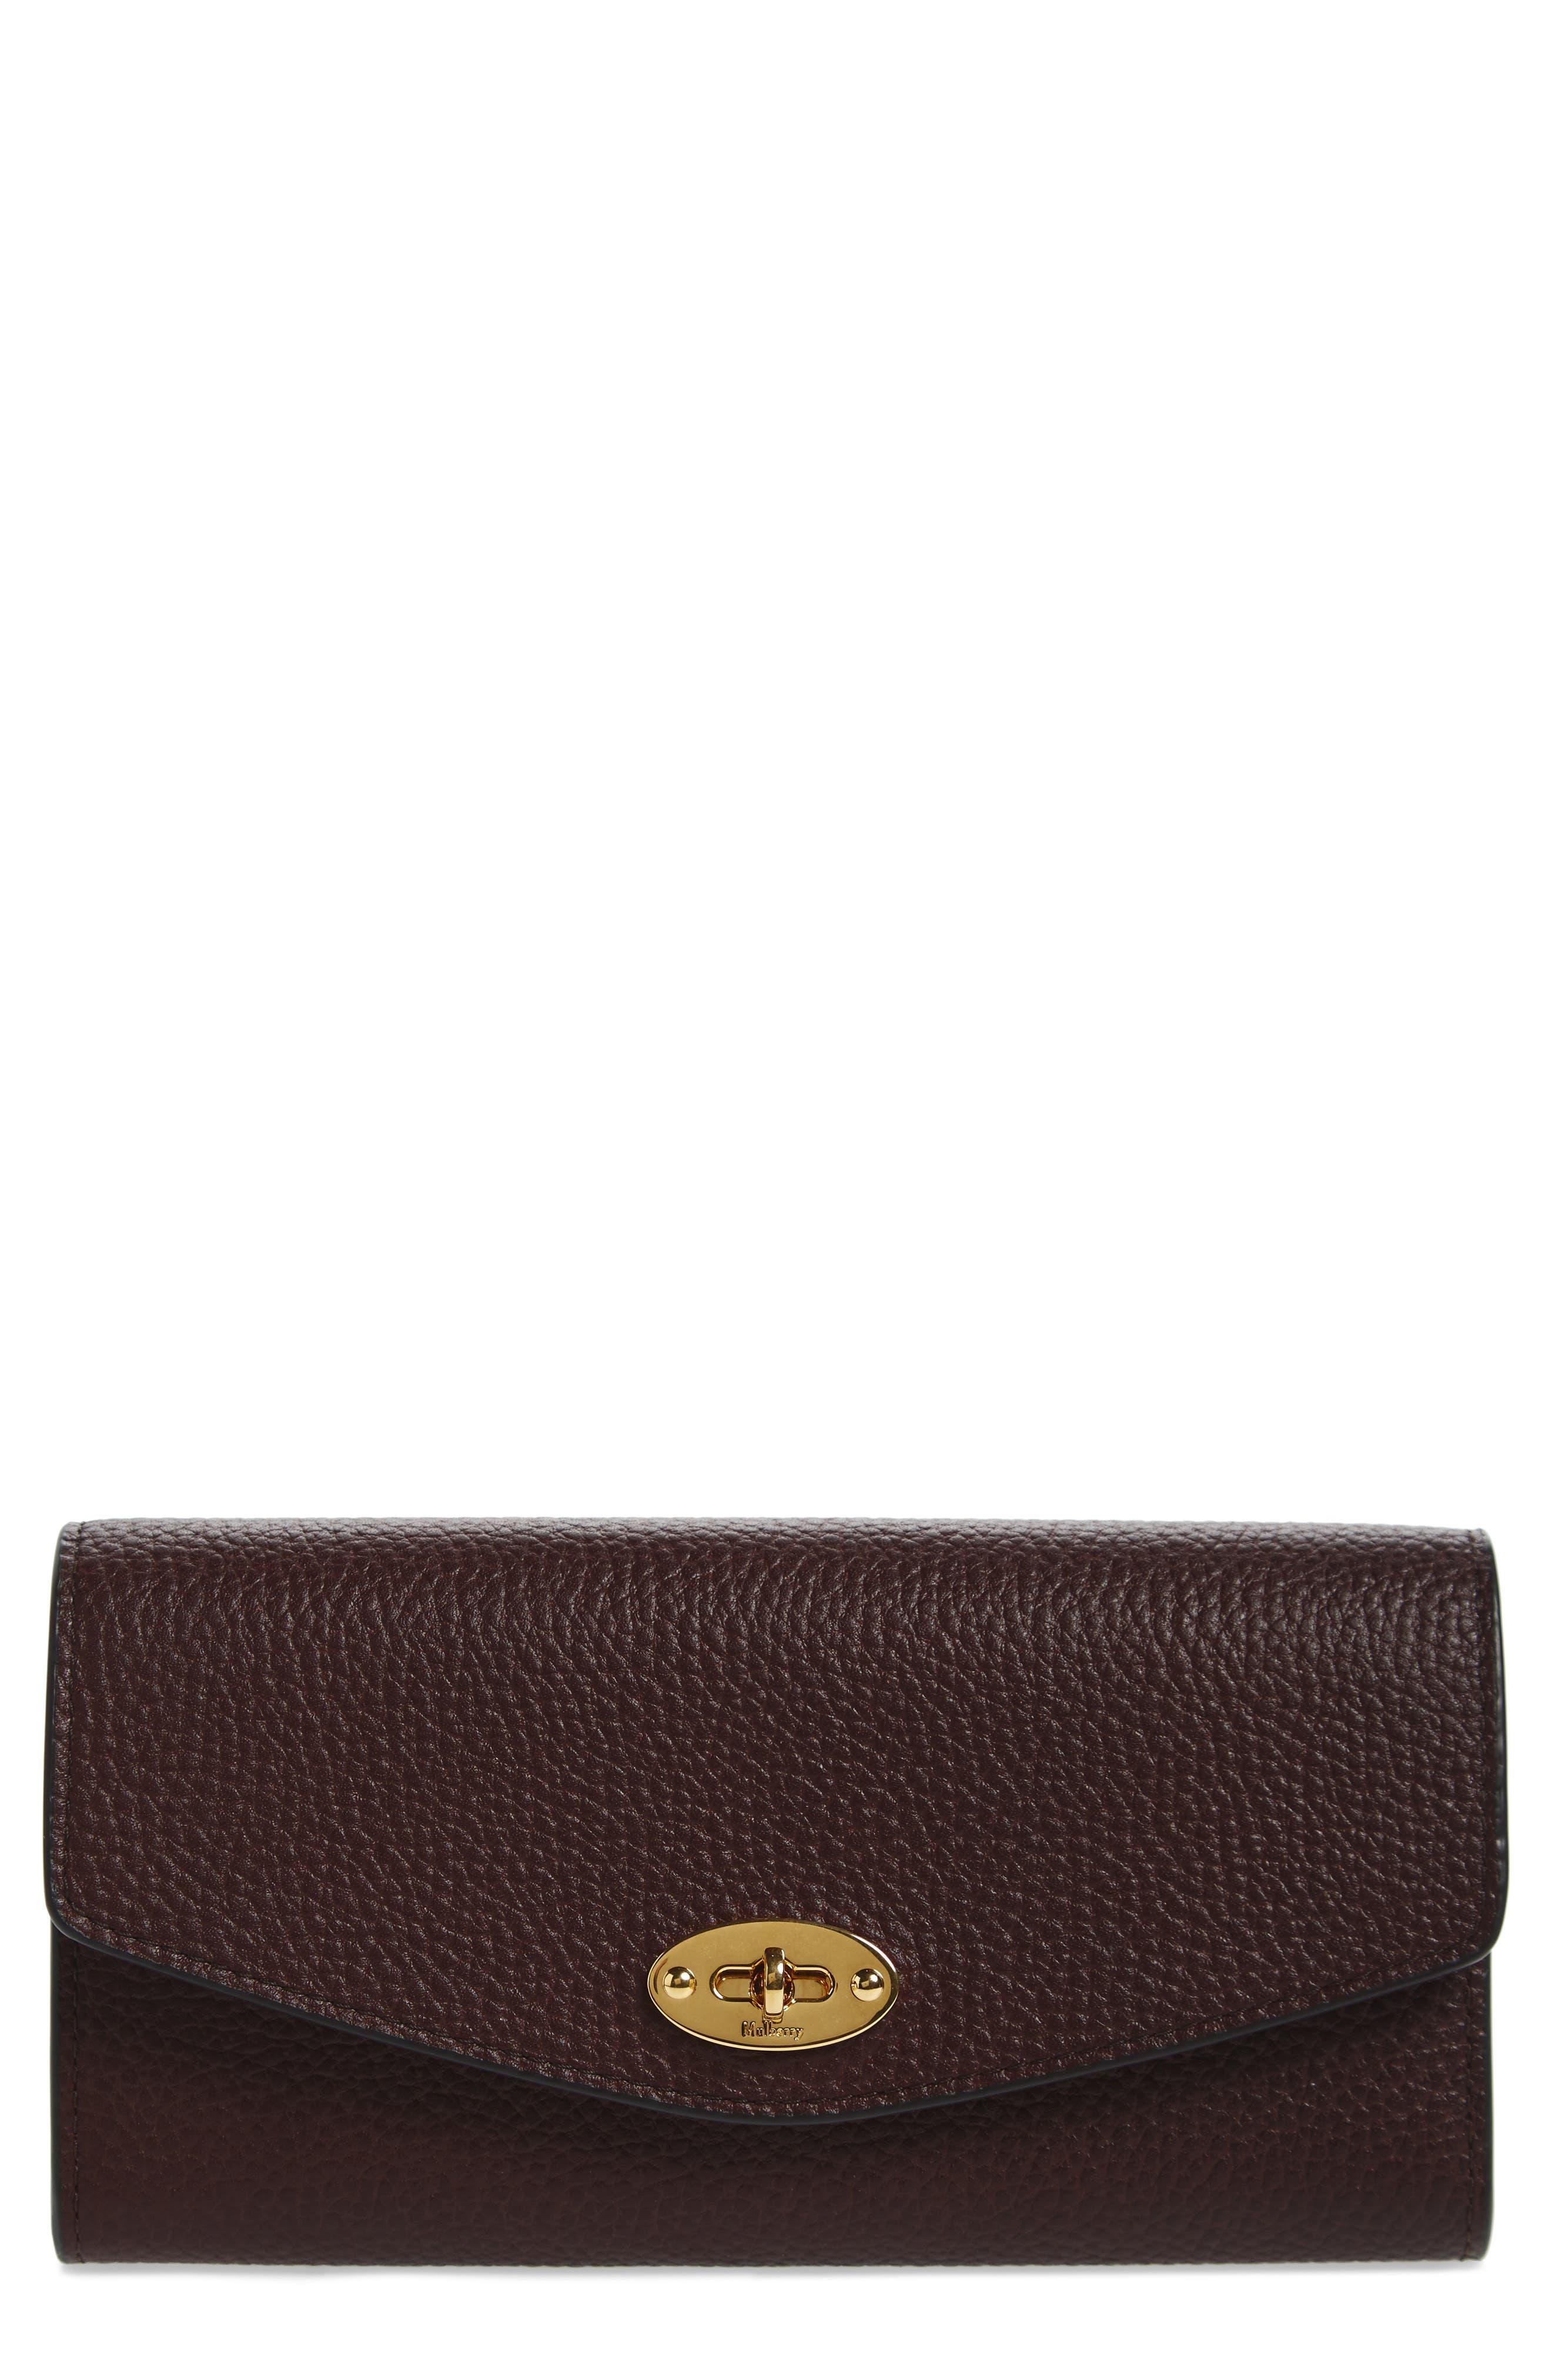 Darley Continental Calfskin Leather Wallet,                             Main thumbnail 1, color,